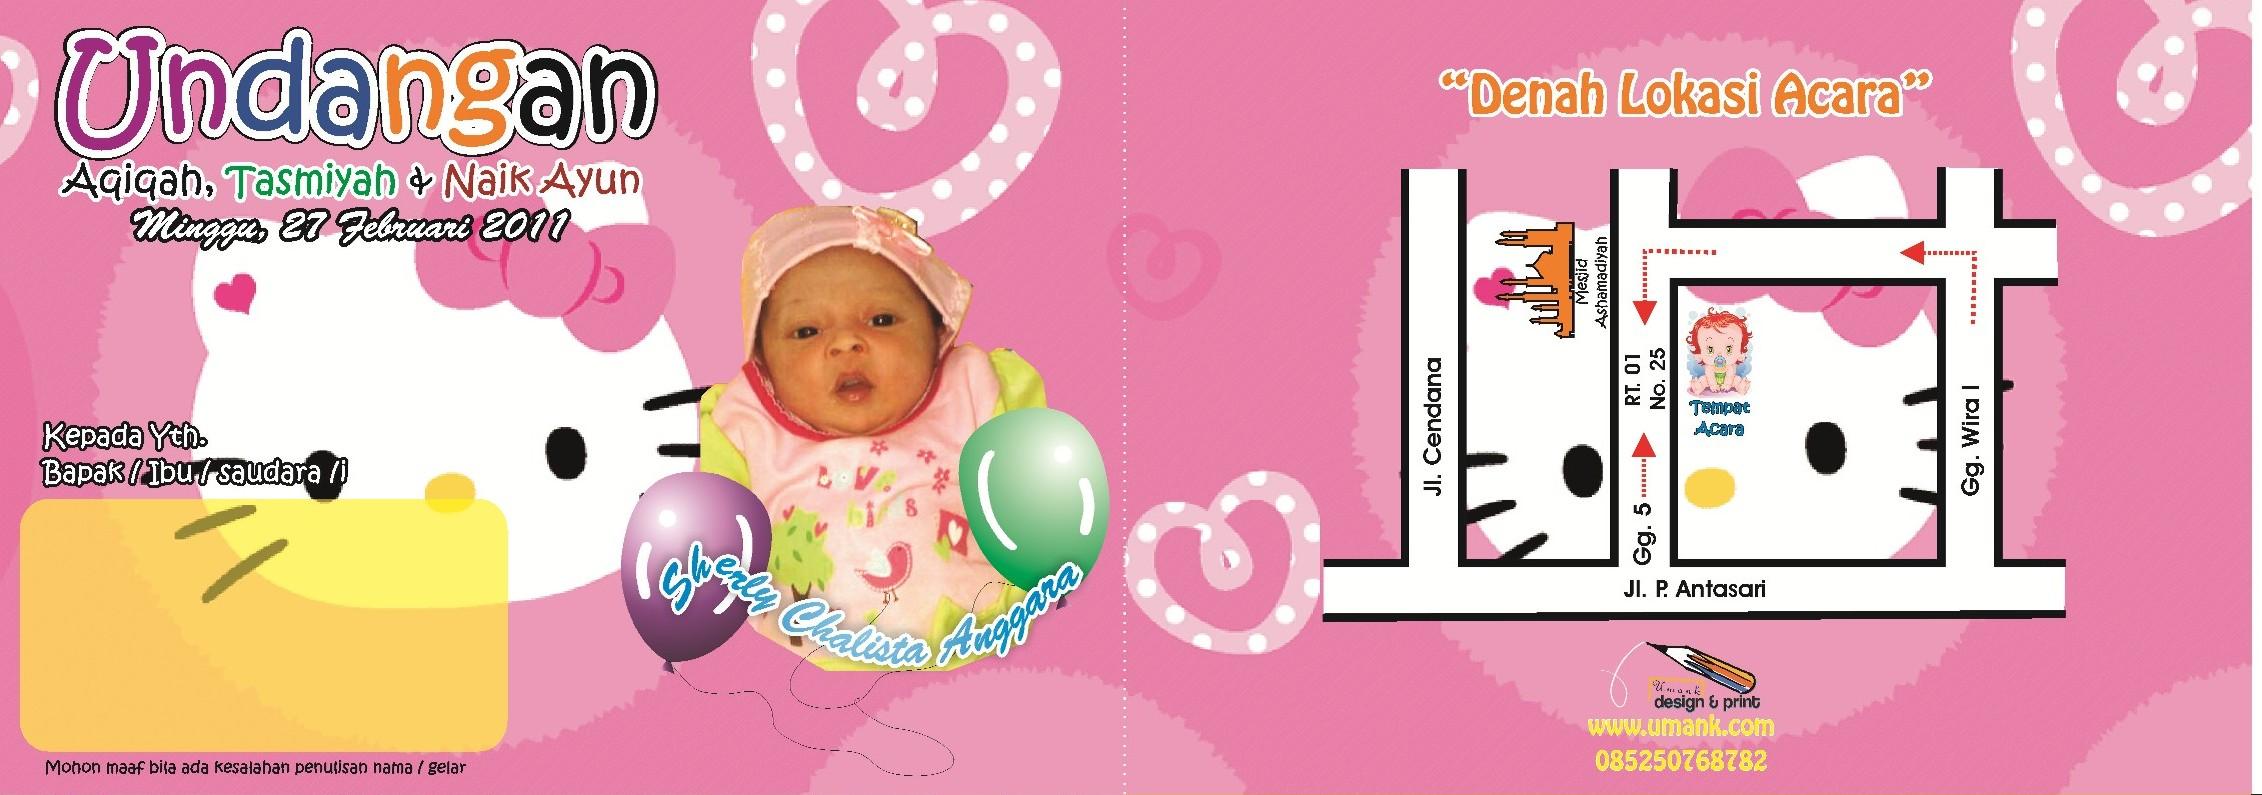 Undangan Tasmiyah Chalisa (Tema: Hello Kitty)